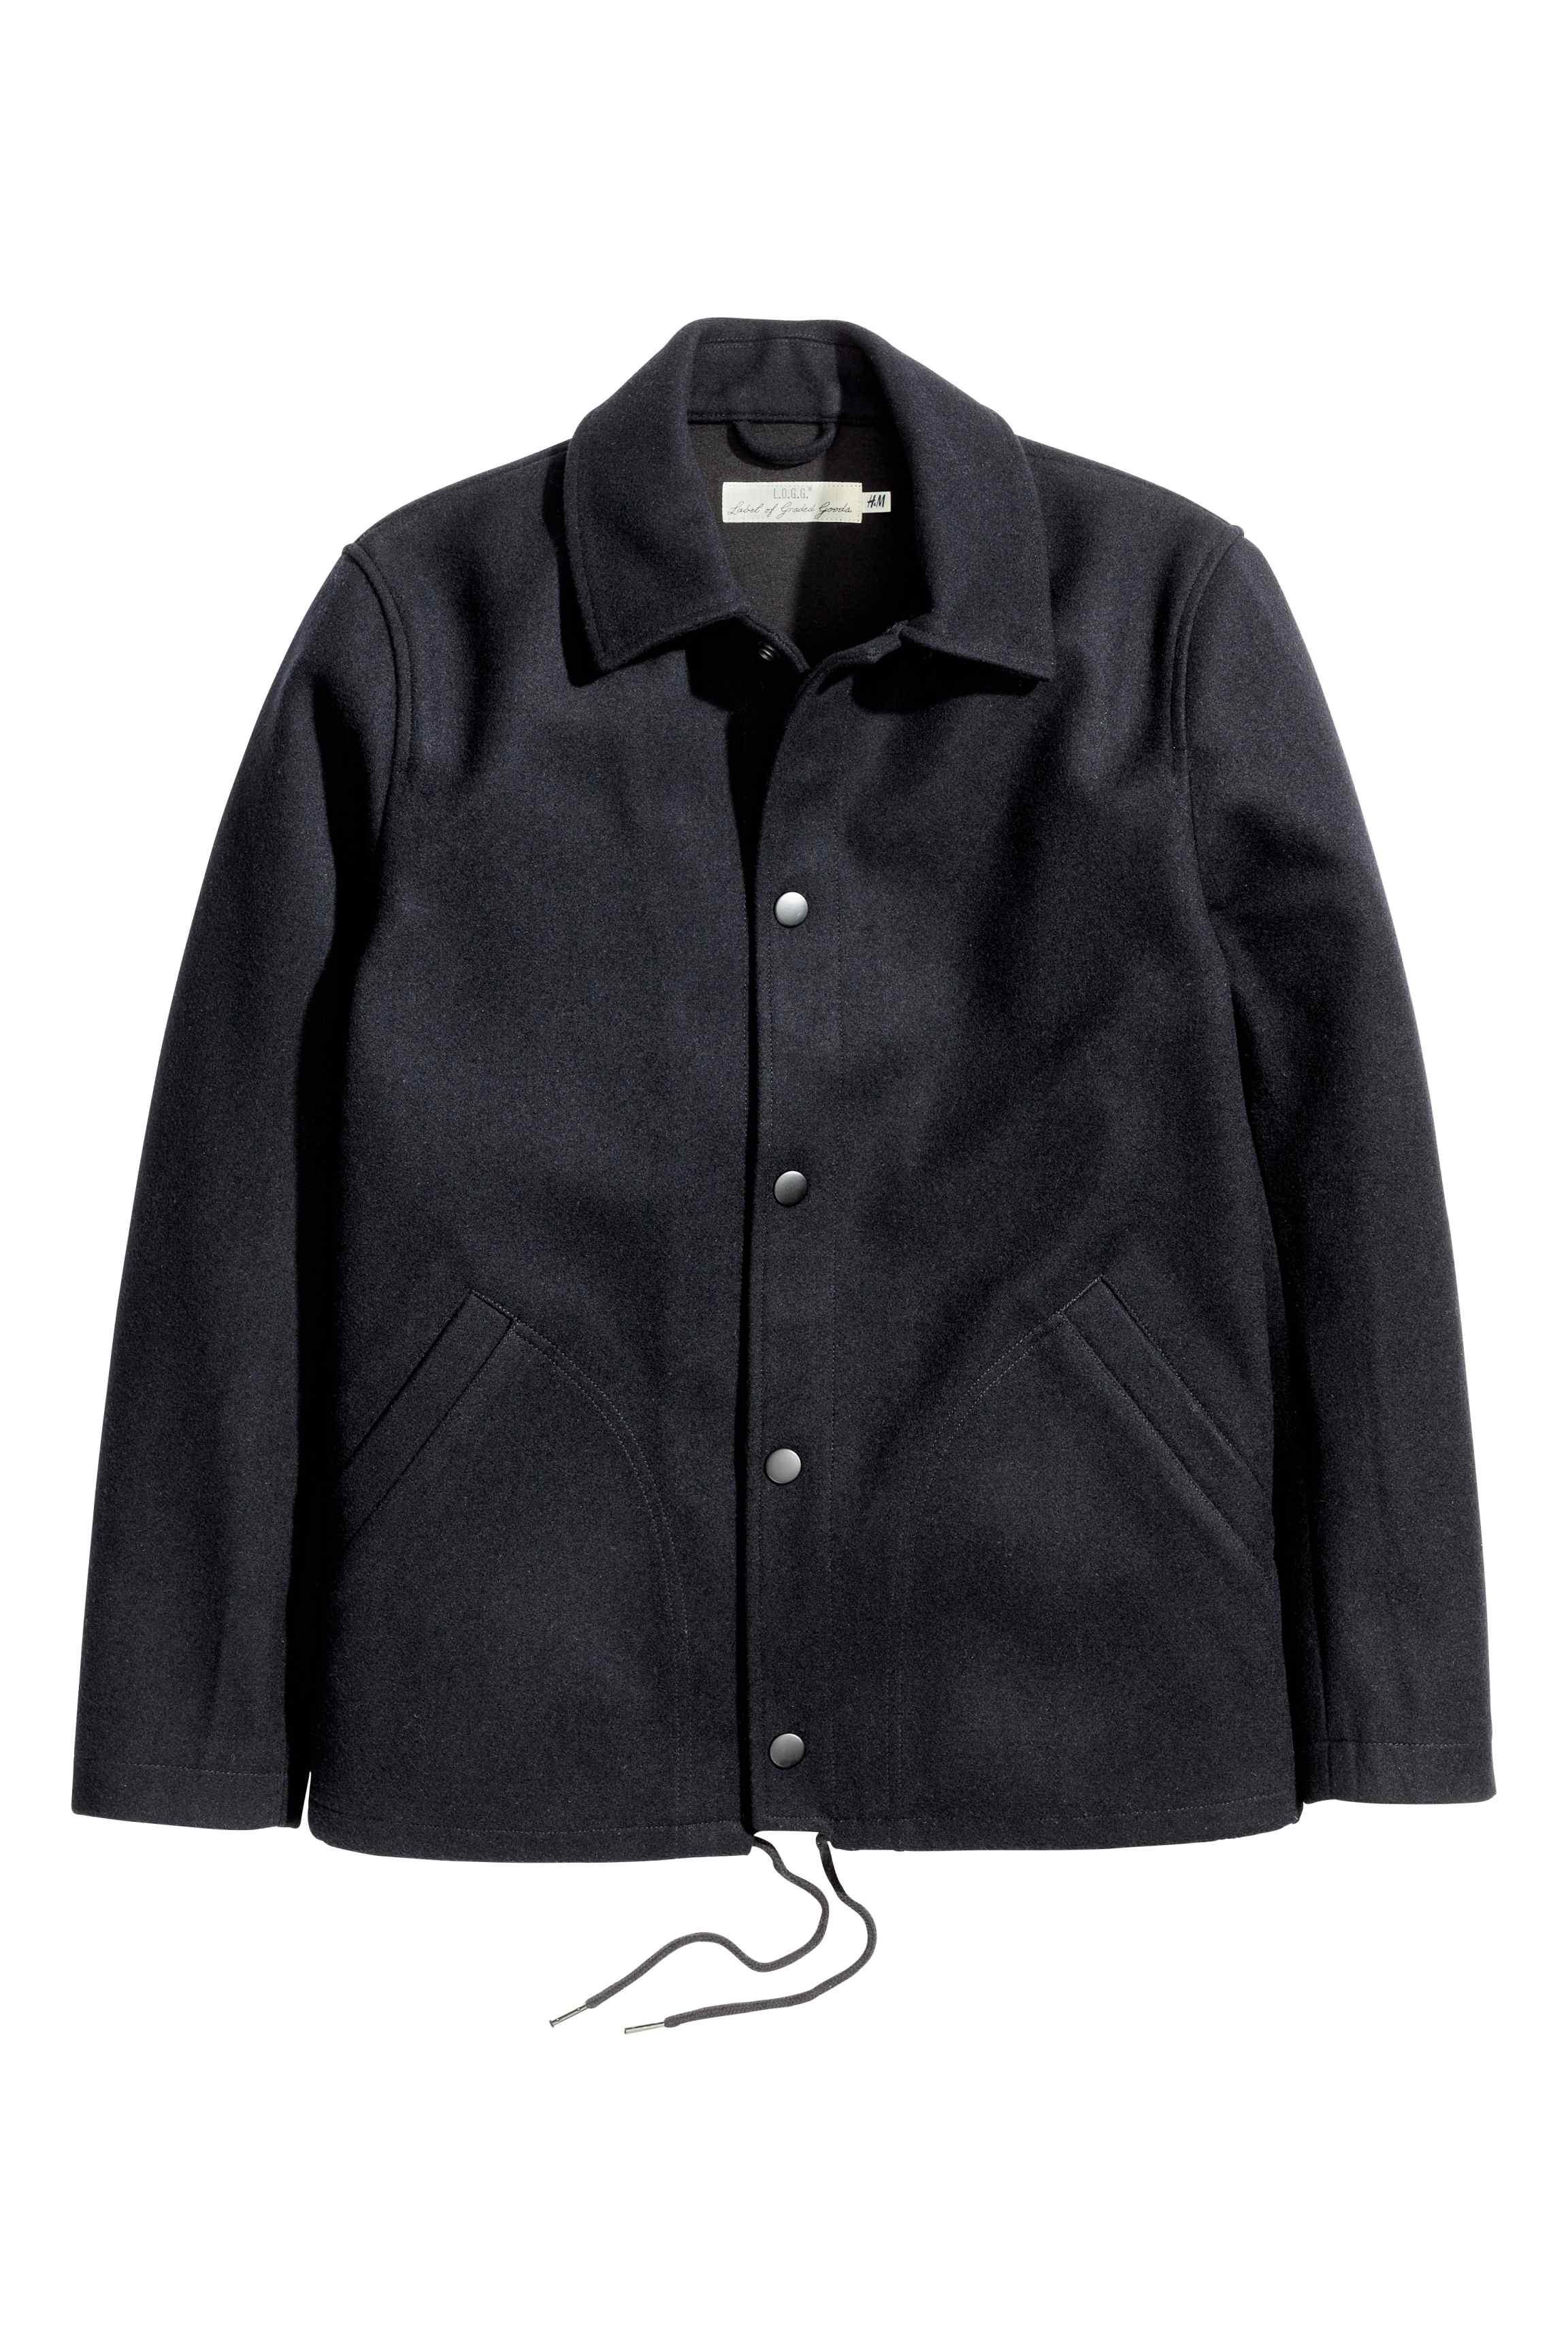 Wool-blend coach jacket, £49.99 ( hm.com )